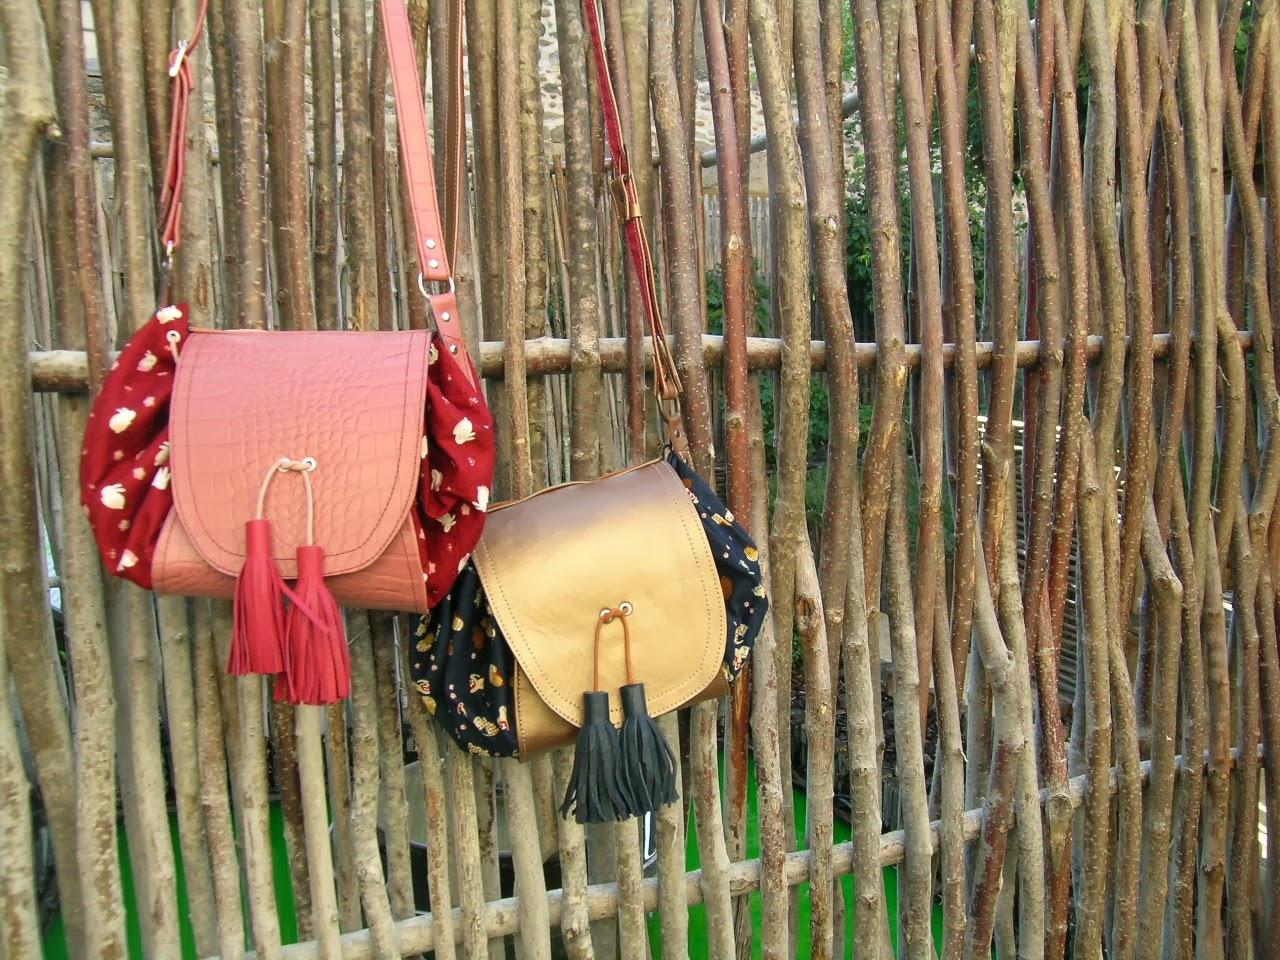 http://accessoires-cortana.blogspot.fr/p/les-sacs-puffy.html